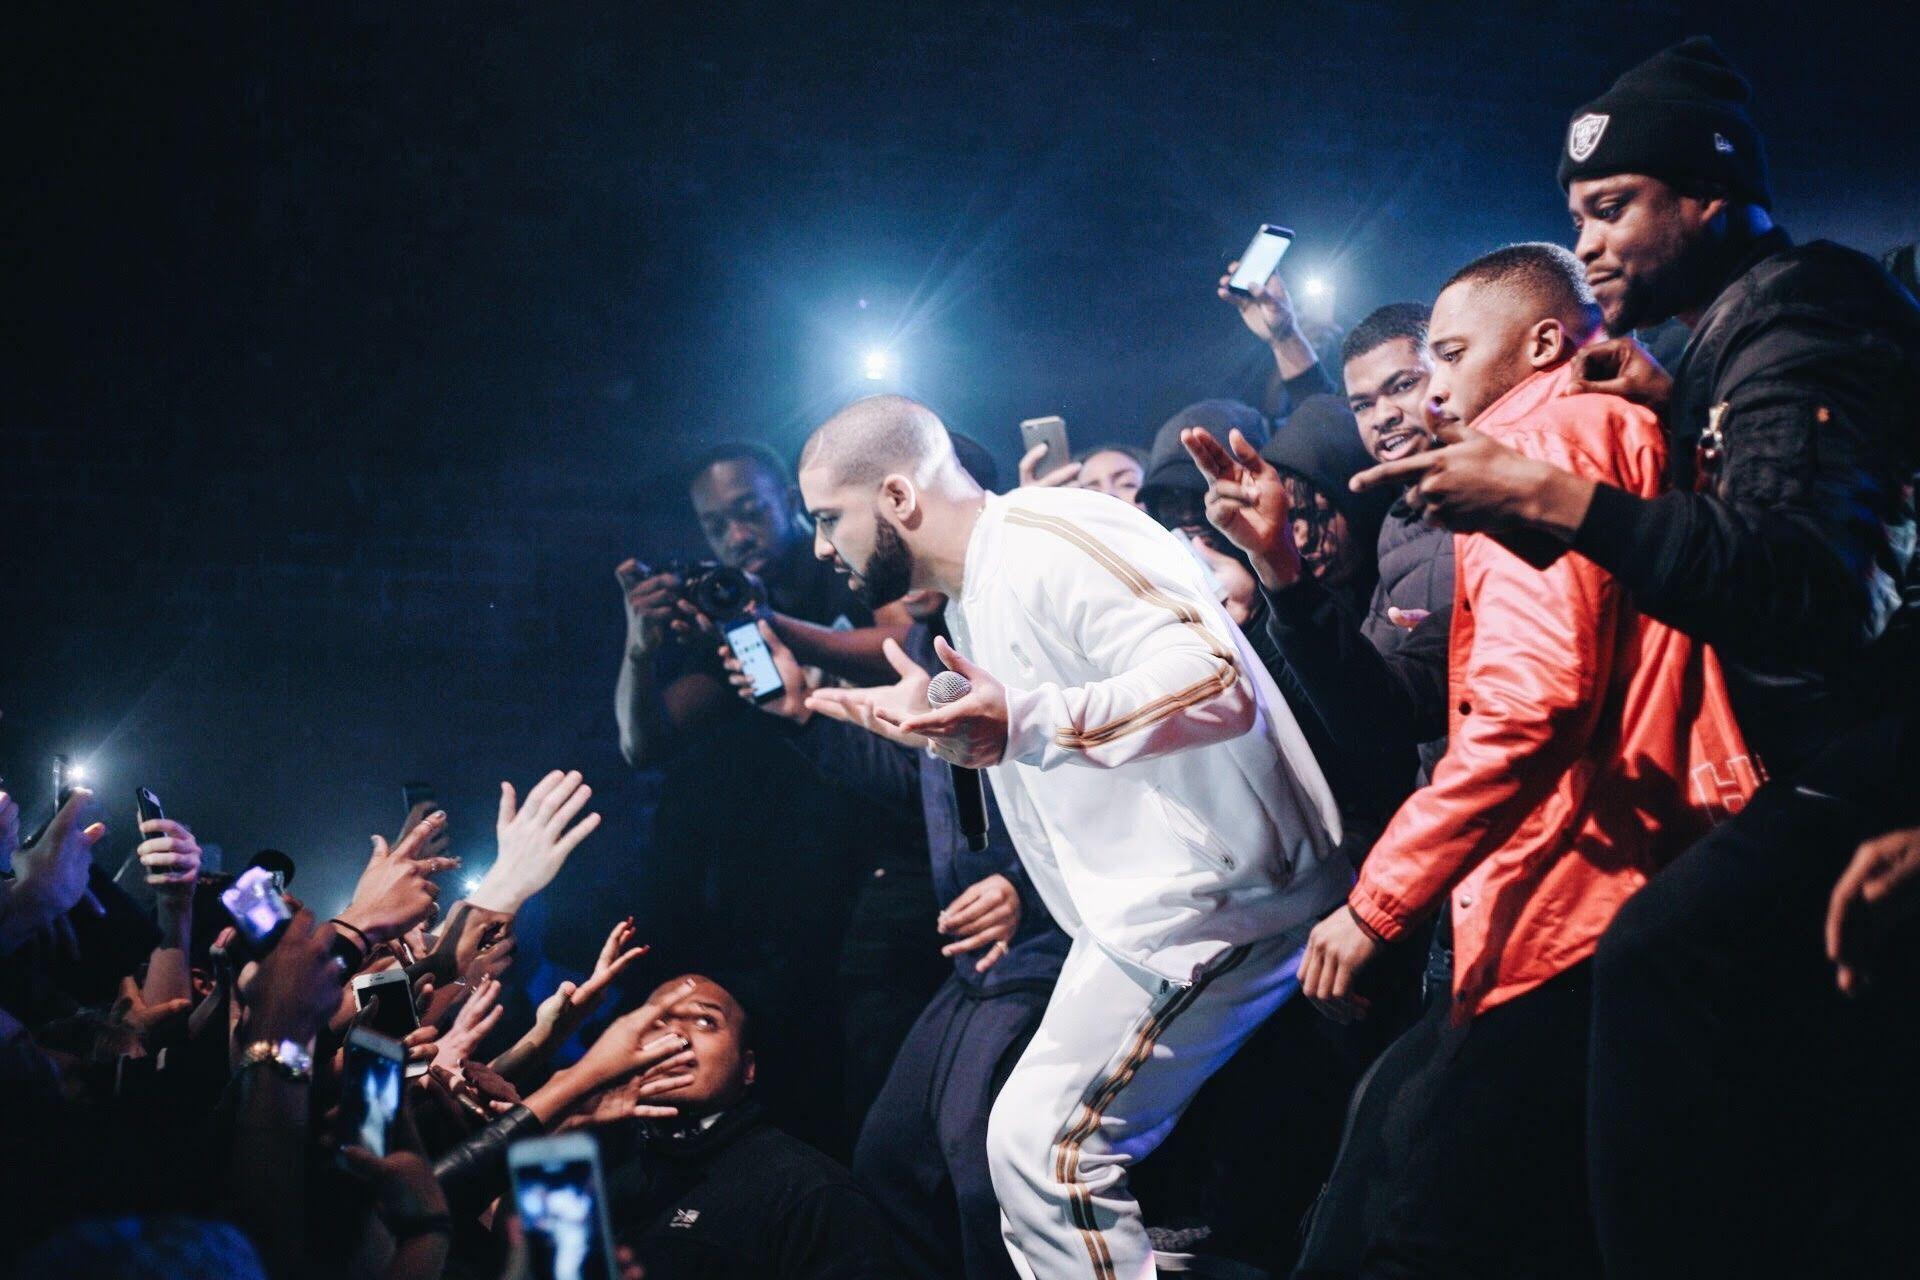 HERITAGE: Smoke Boys Bring Out Drake And Skepta During Their Epic Headline Show (2016)